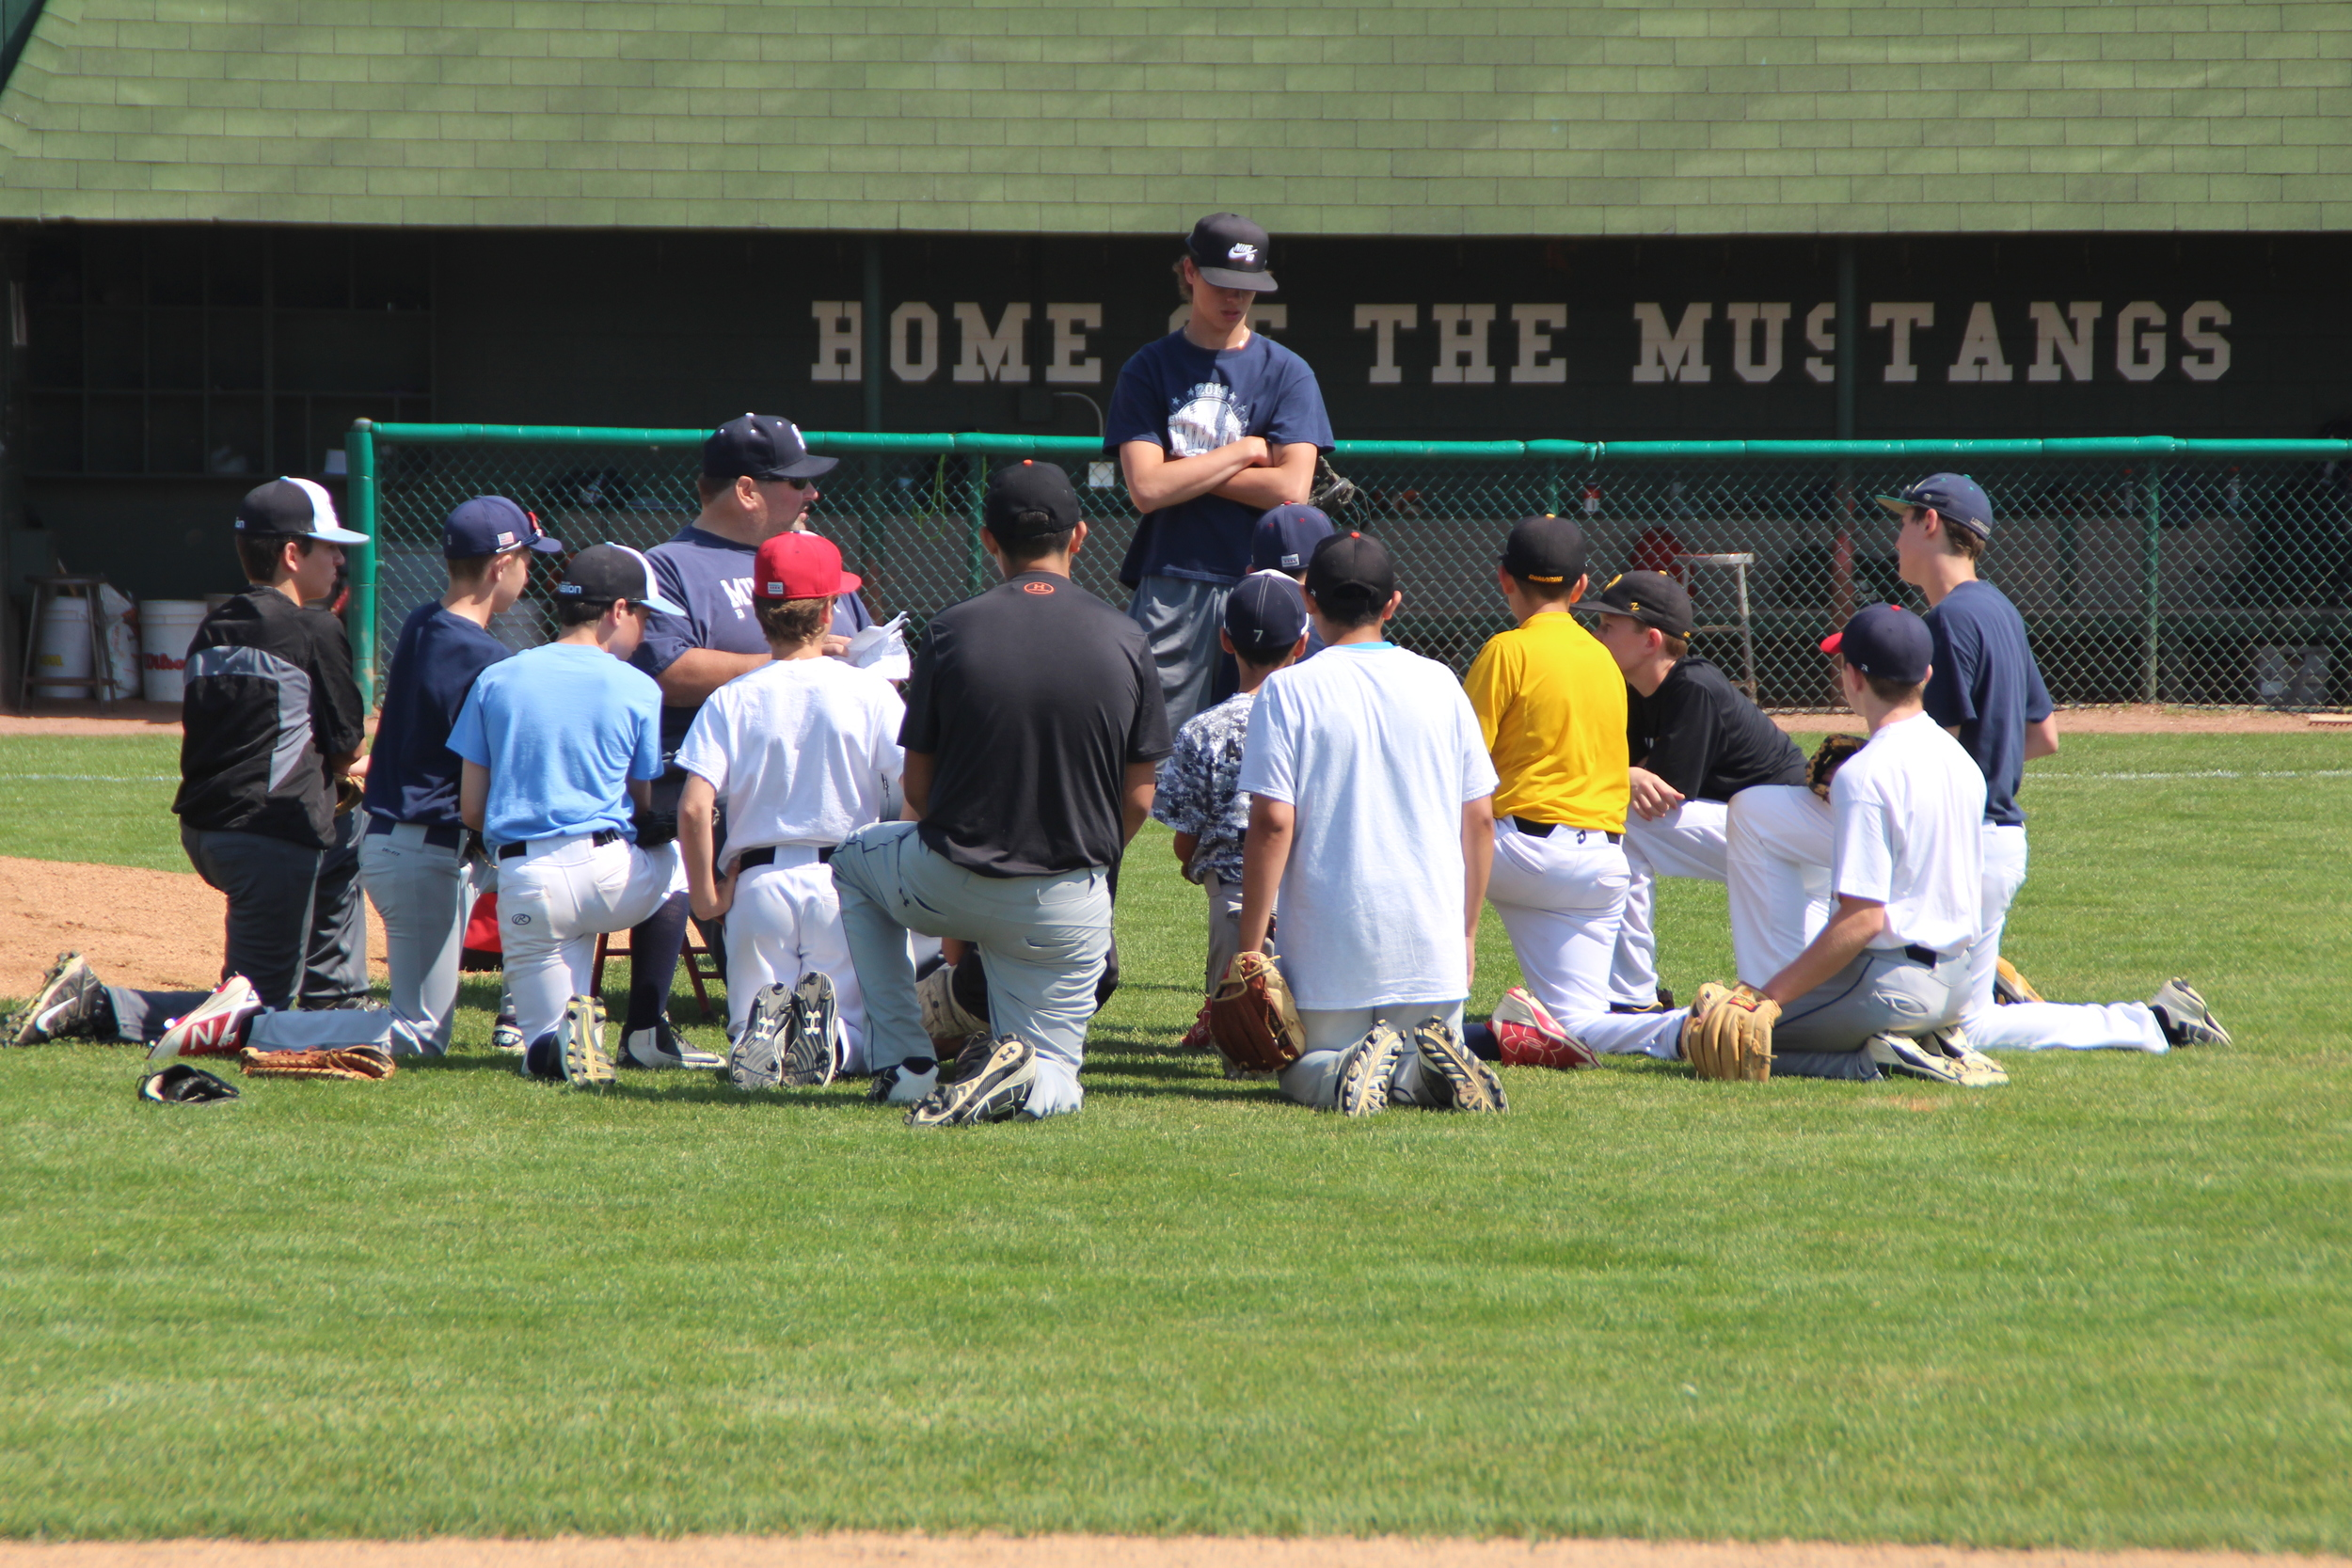 Summer Grammar-school baseball camp